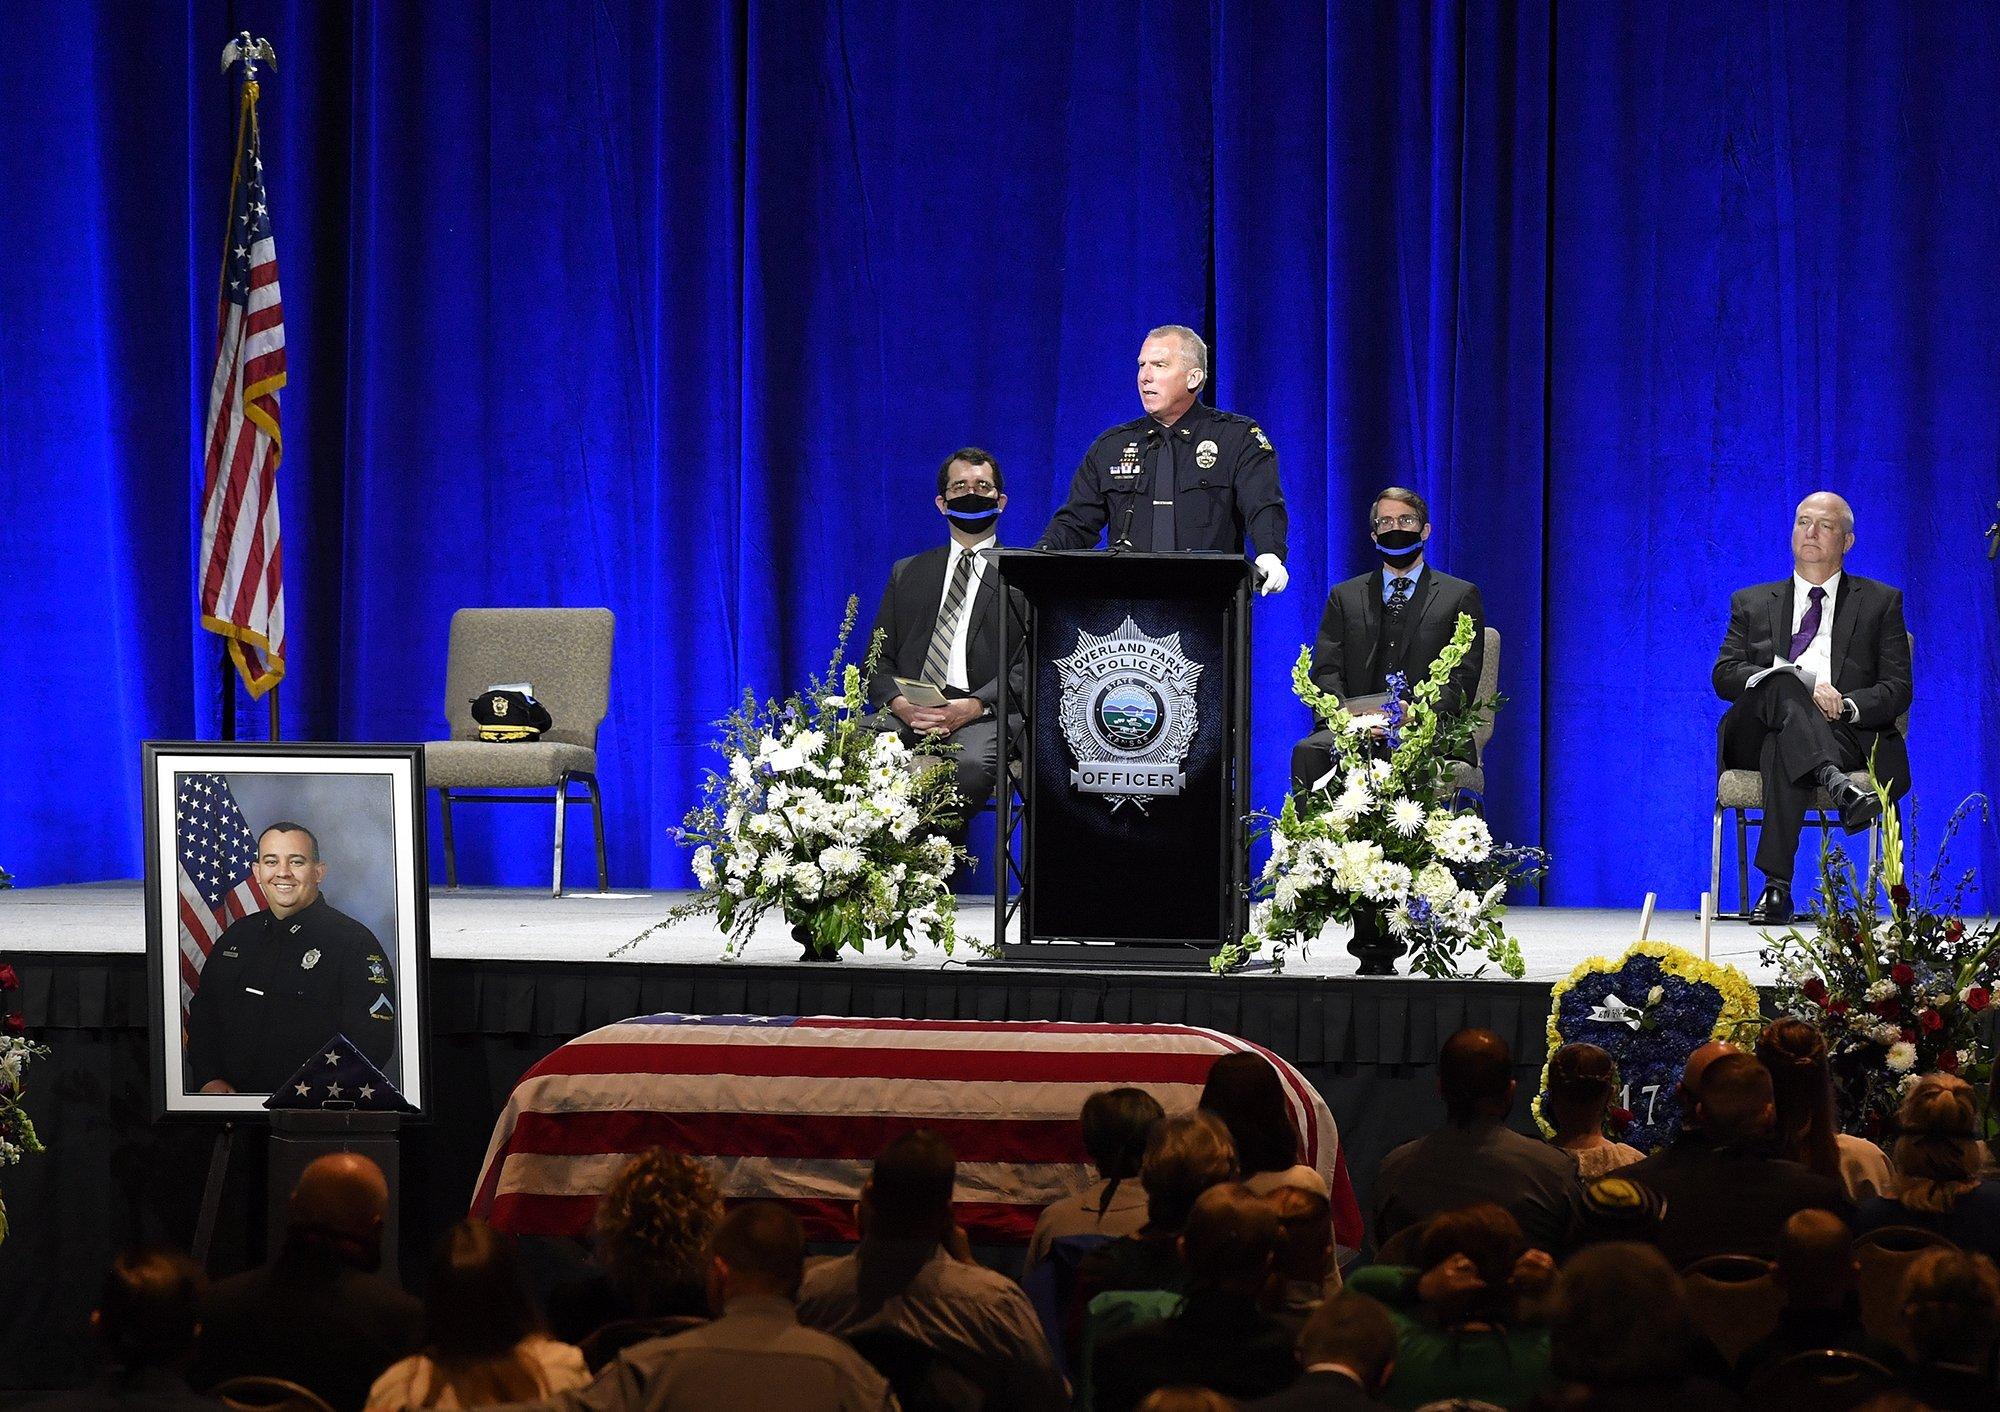 OP police funeral May 13